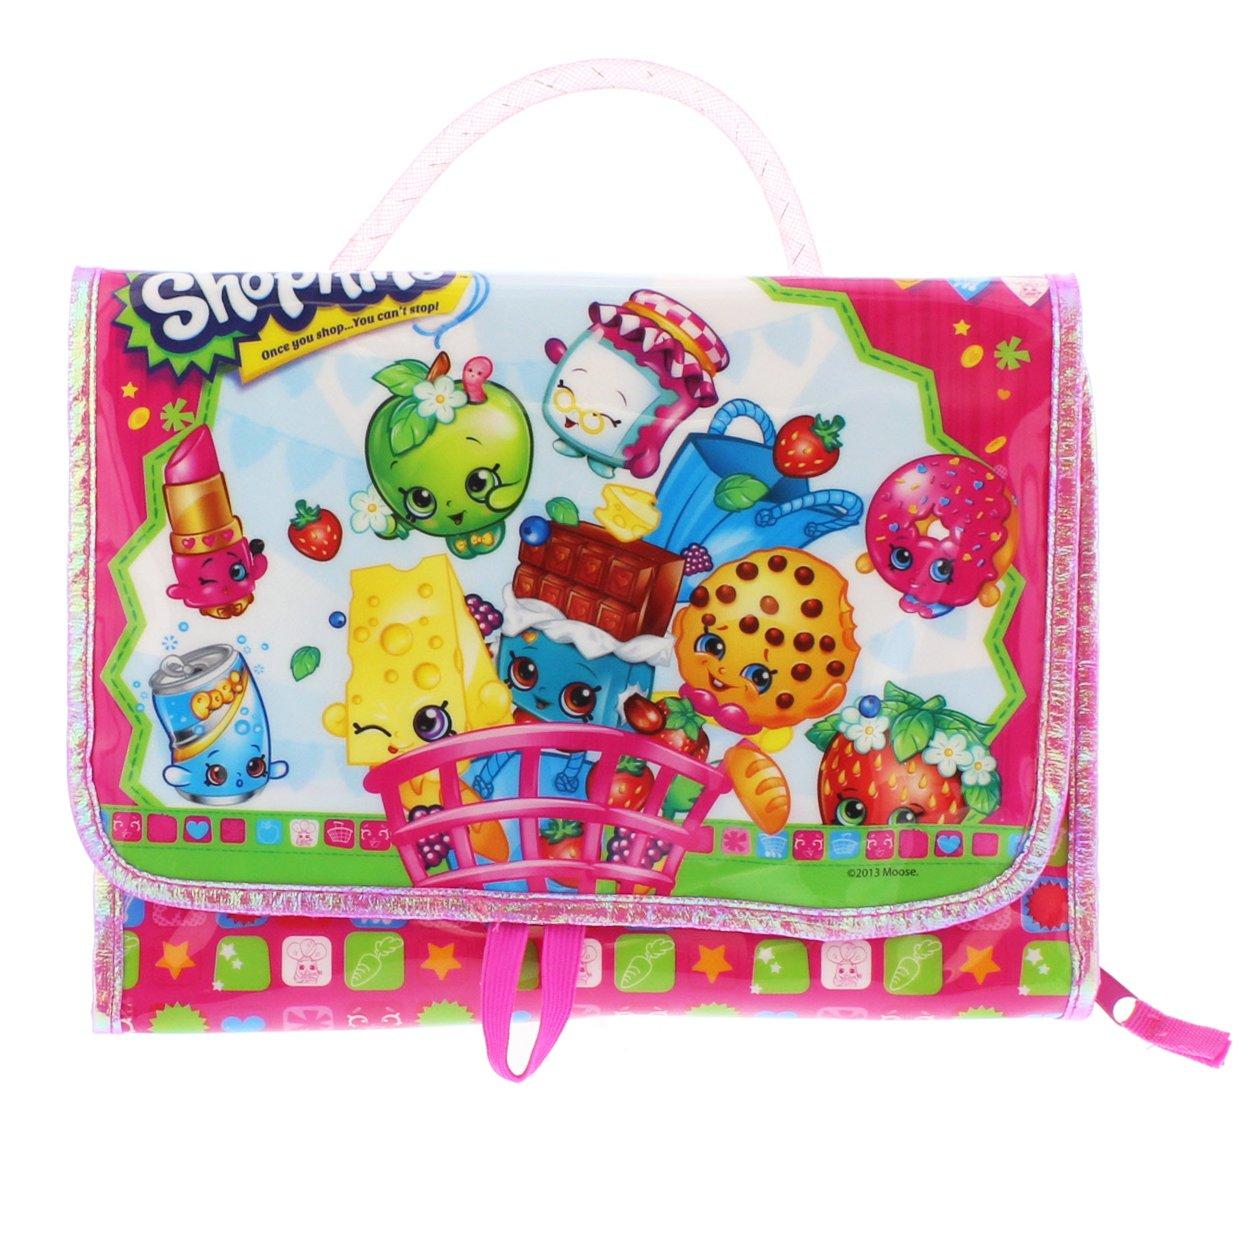 Amazon com shopkins toy carry case figure storage organization toys games